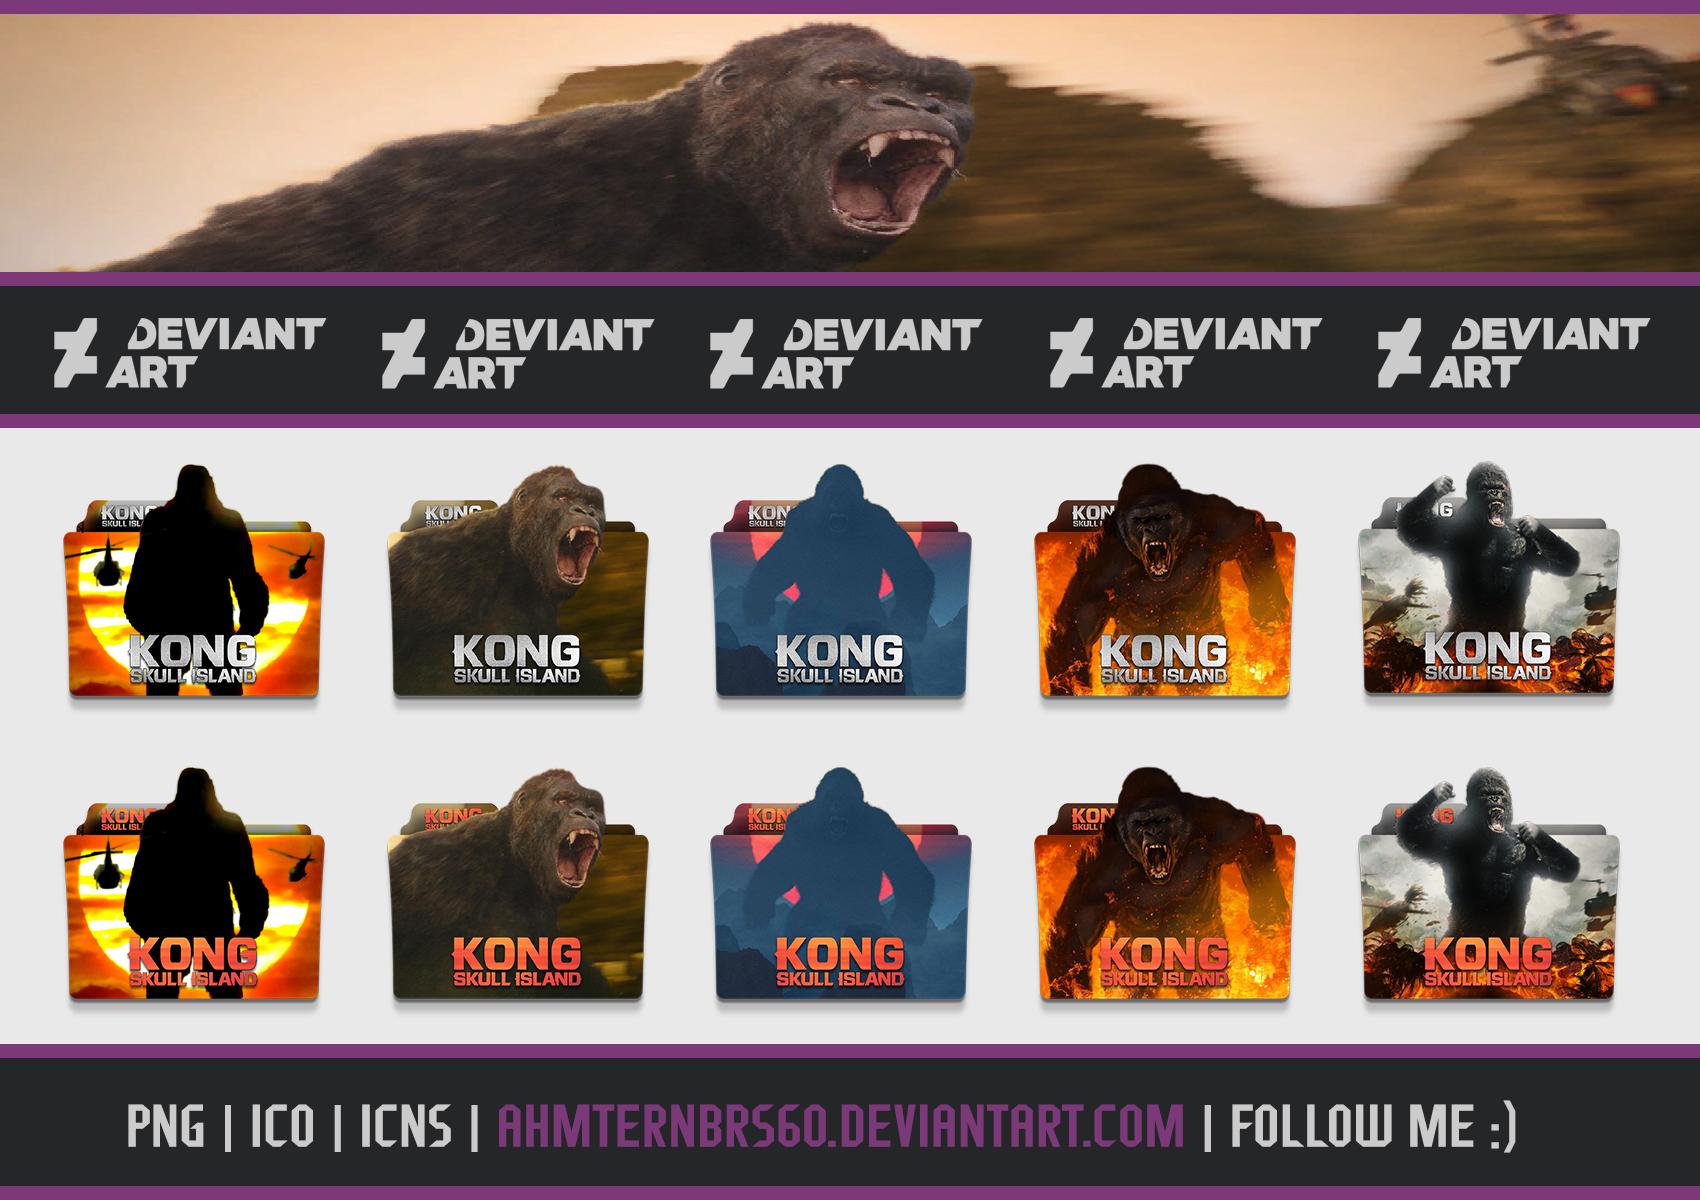 Kong Skull Island 2017 Folder Icon Pack By Ahmternbrs60 On Deviantart